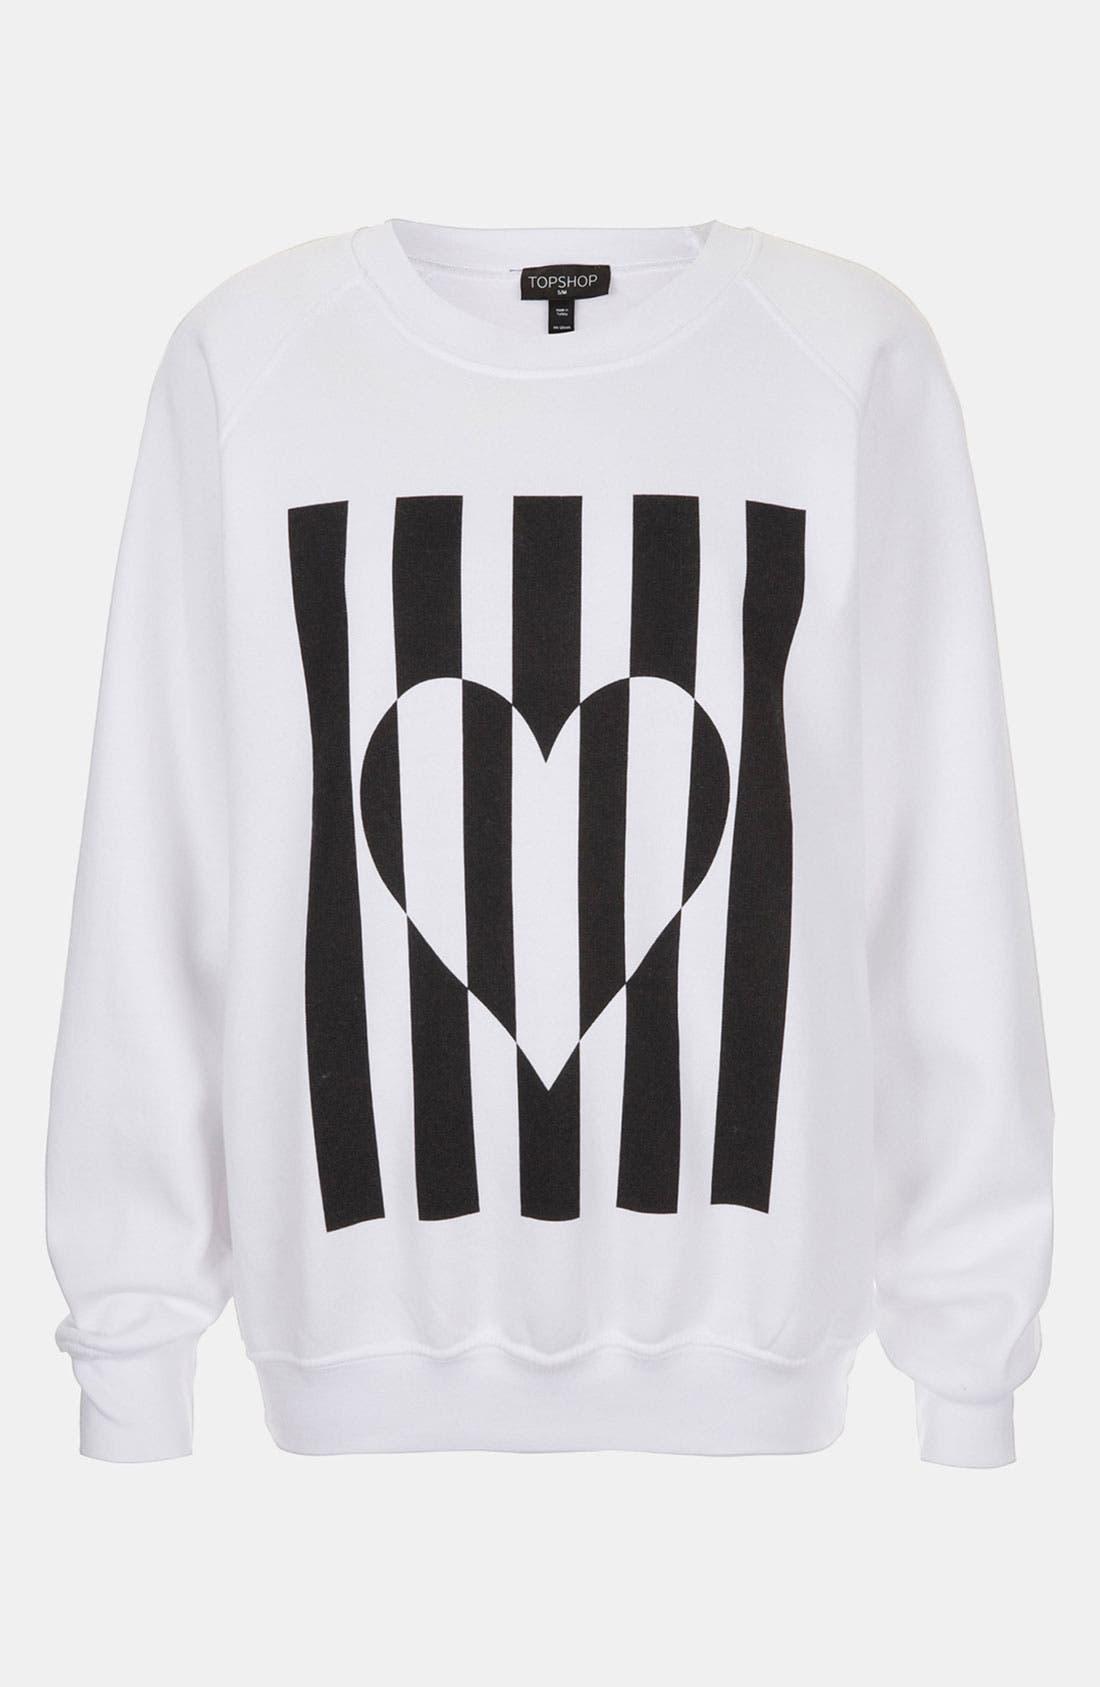 Alternate Image 1 Selected - Topshop Heart Graphic Sweatshirt